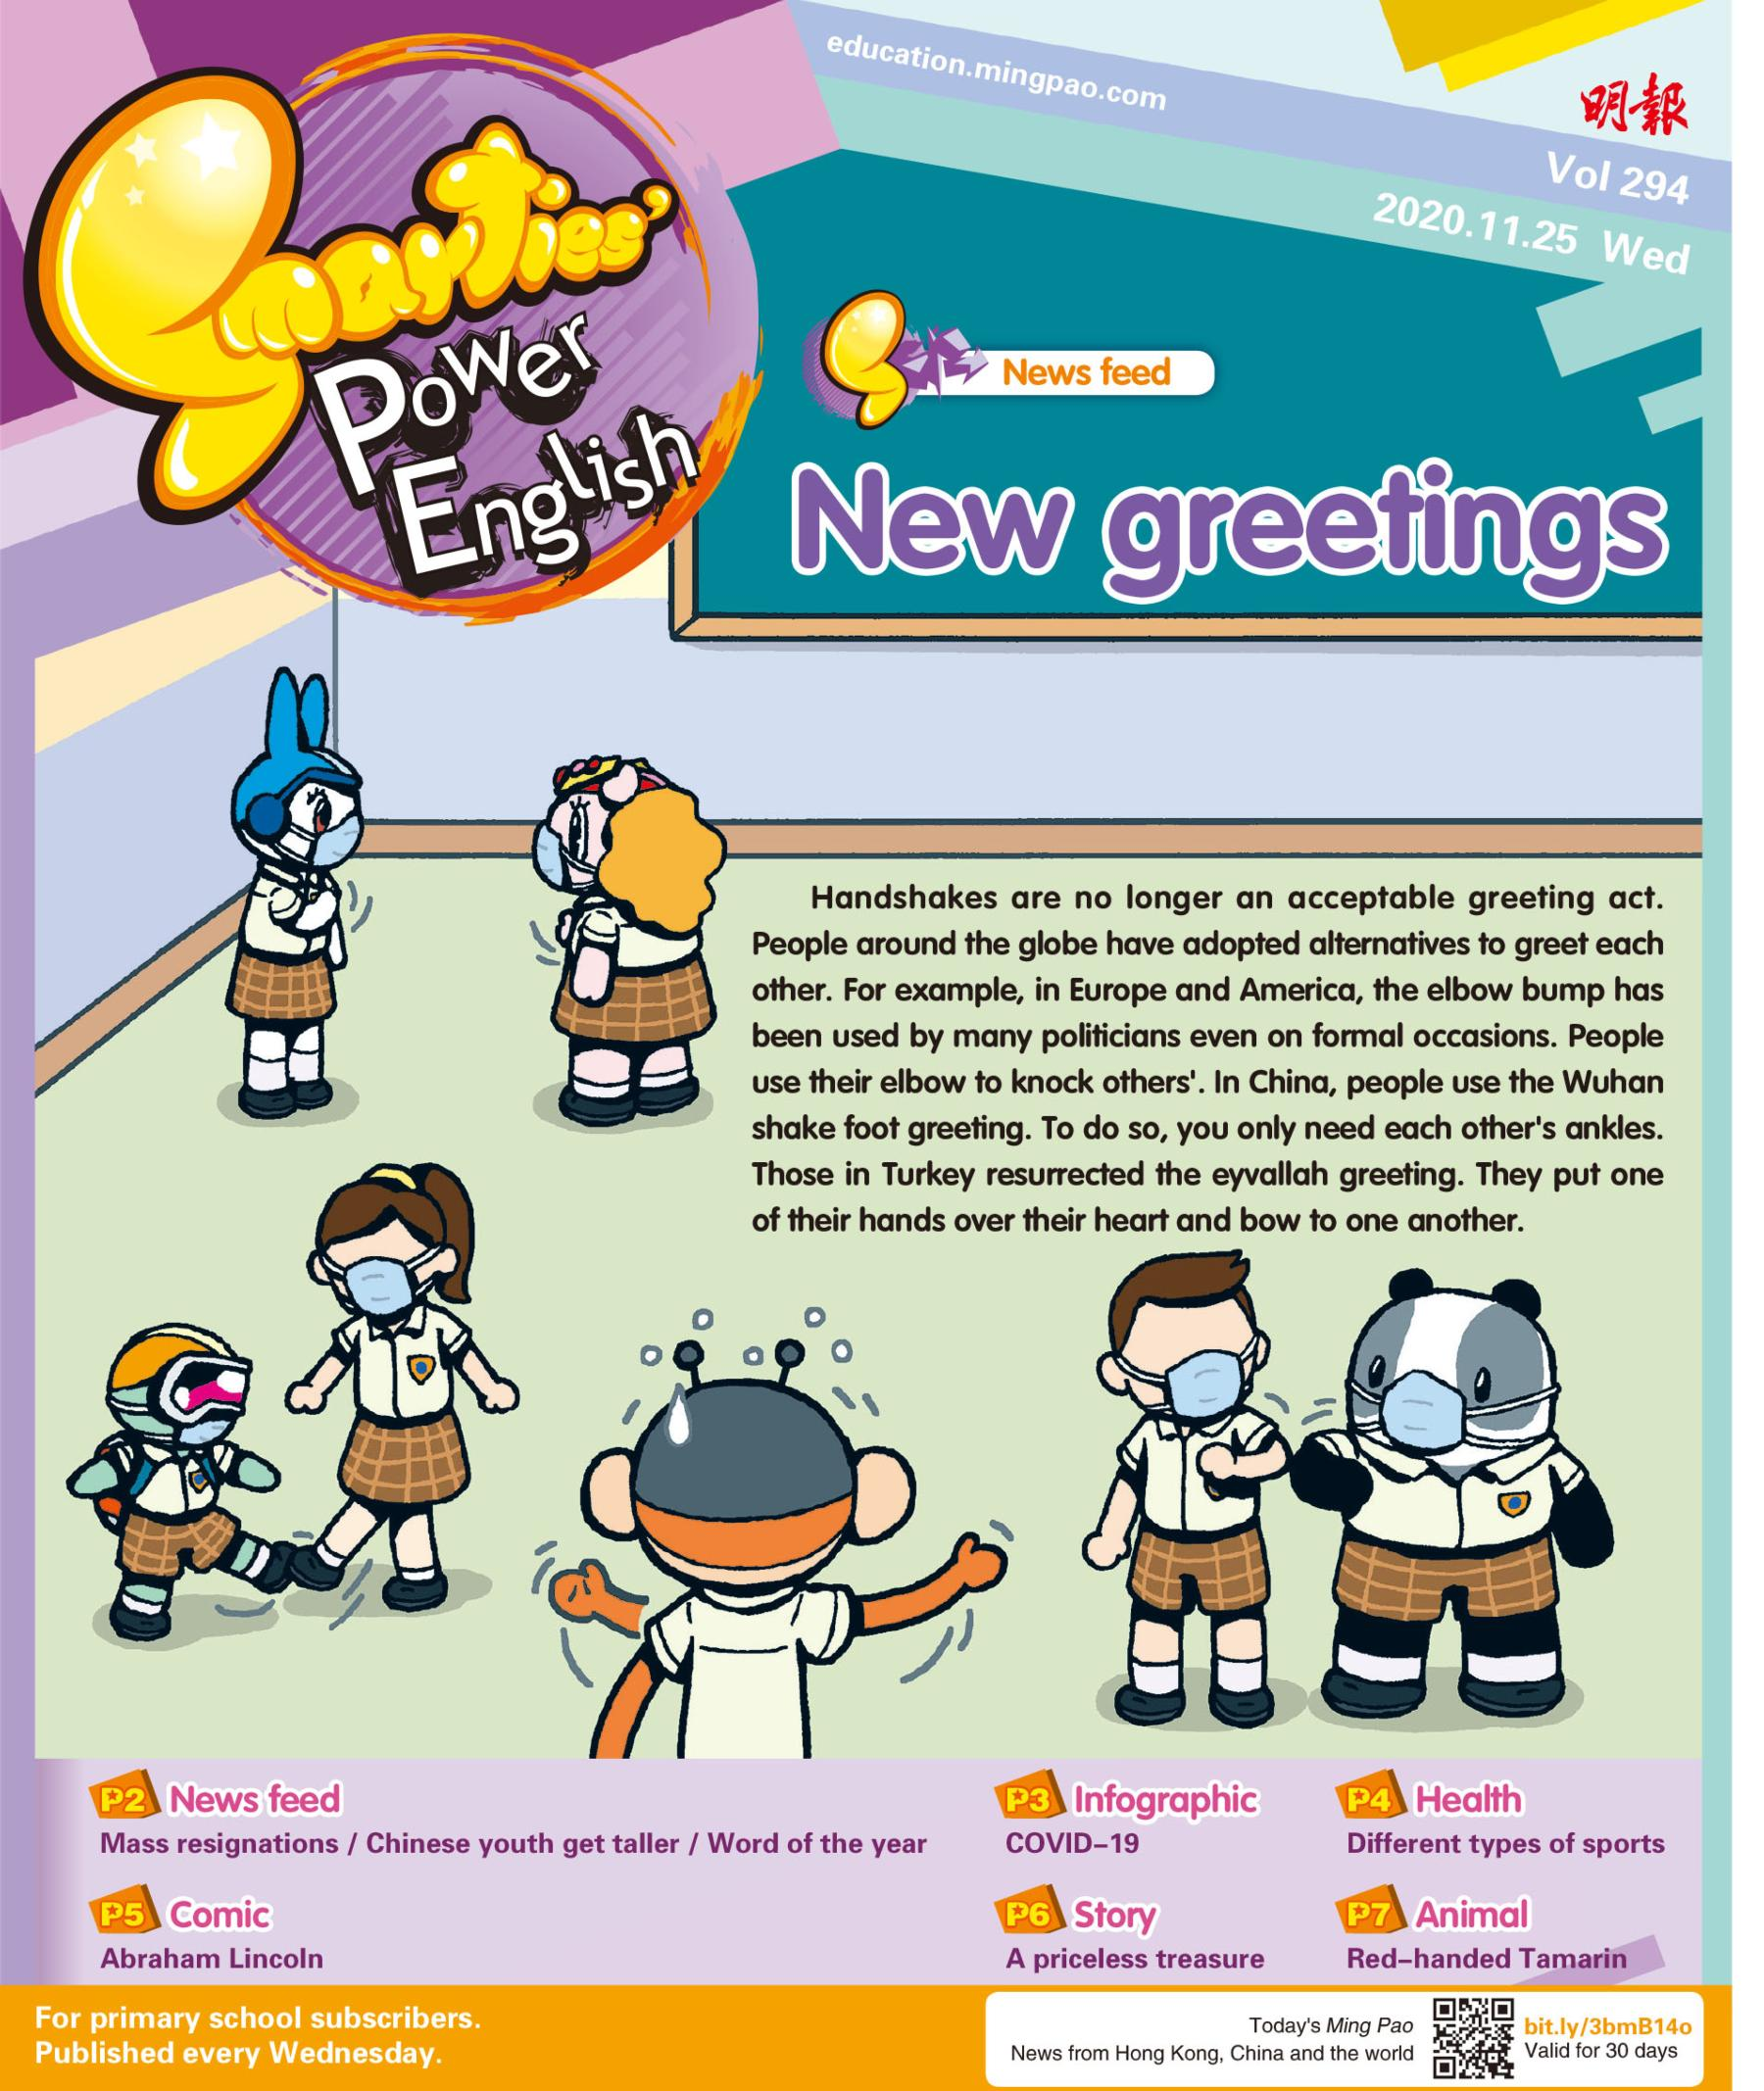 Smarties' Power English